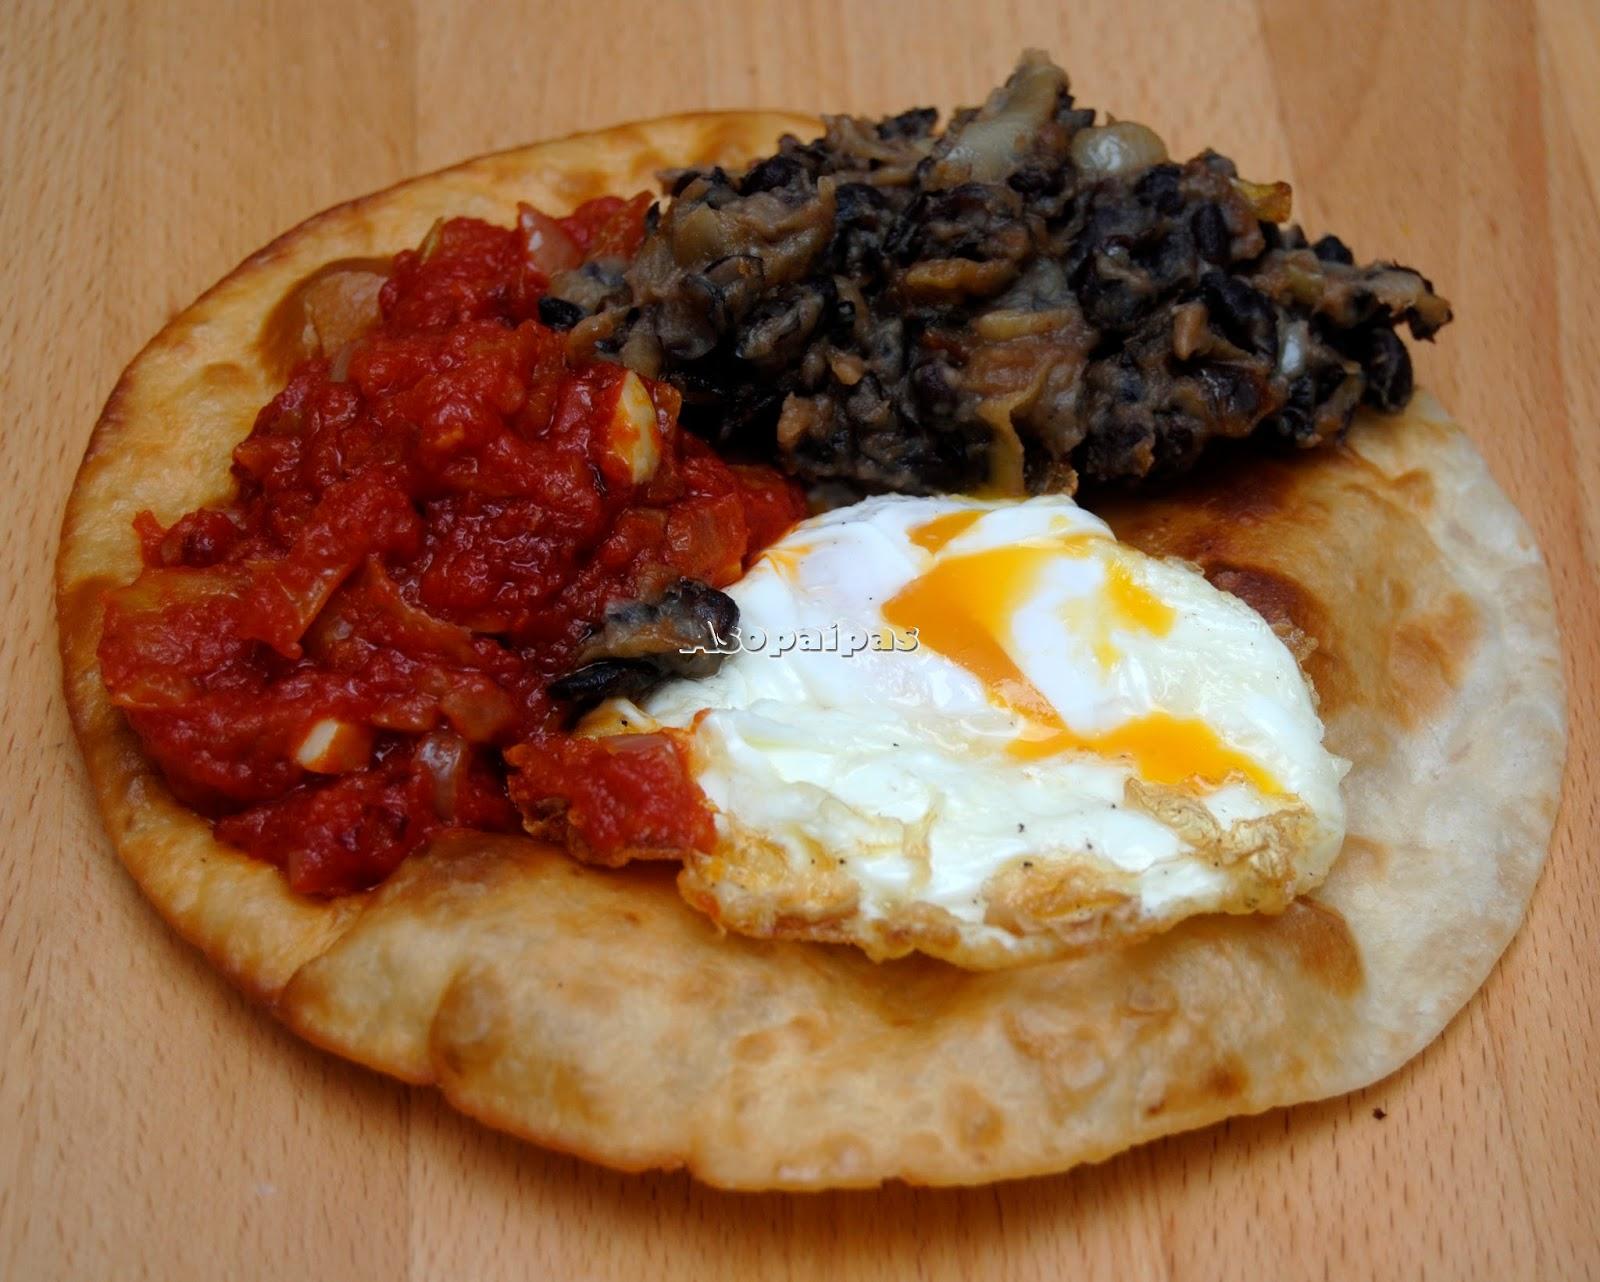 Huevos Rancheros con alubias salsa de tomate huevo frito